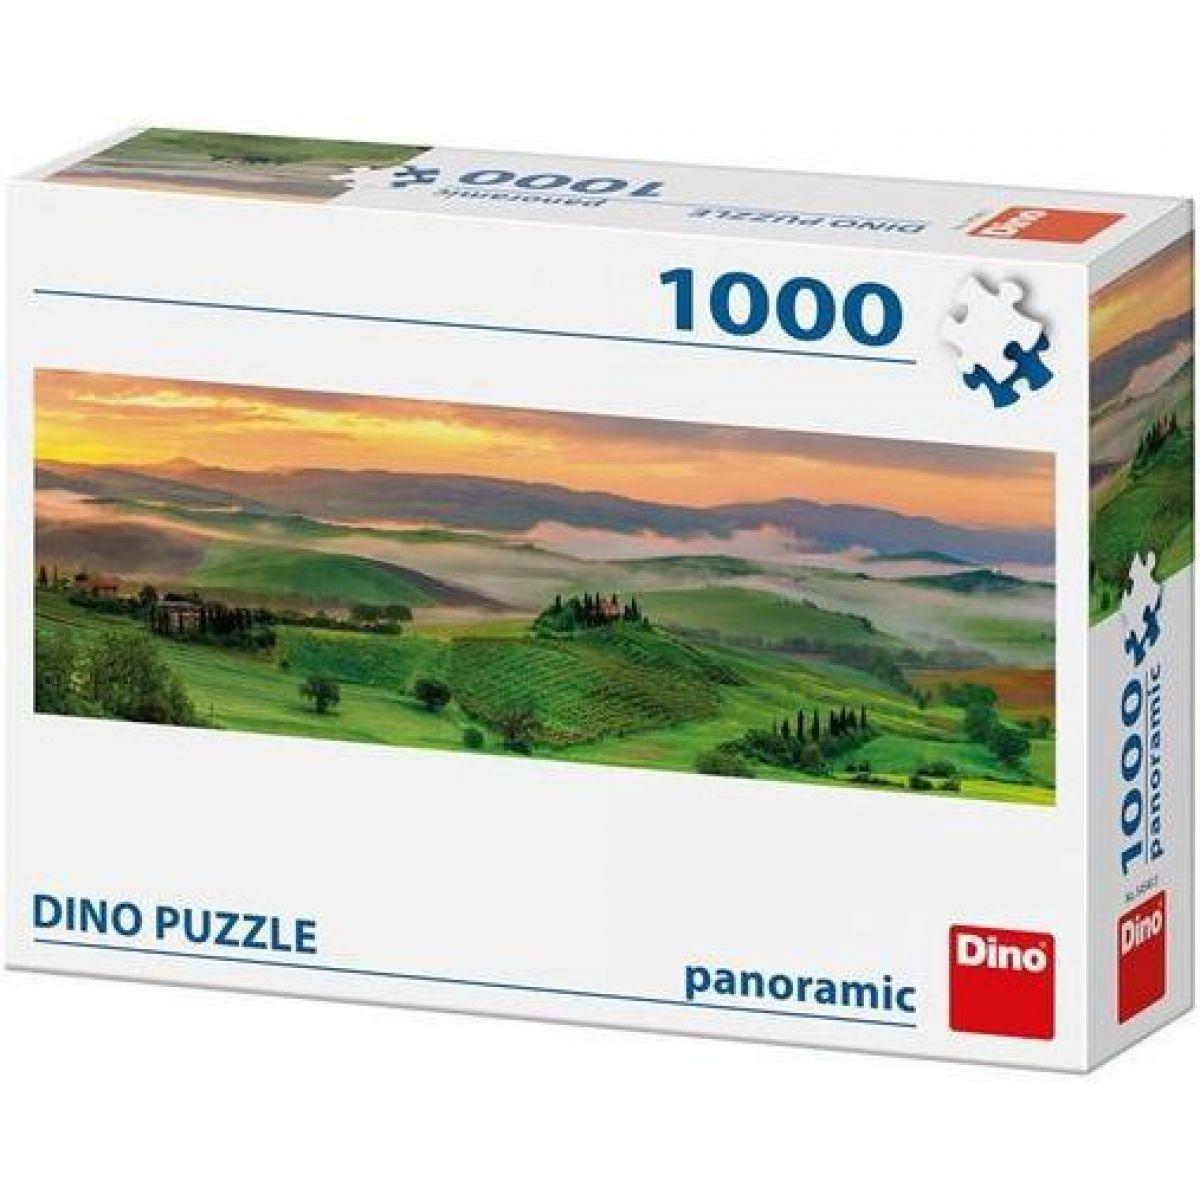 Dino Příroda Panoramic puzzle 1000 dílků